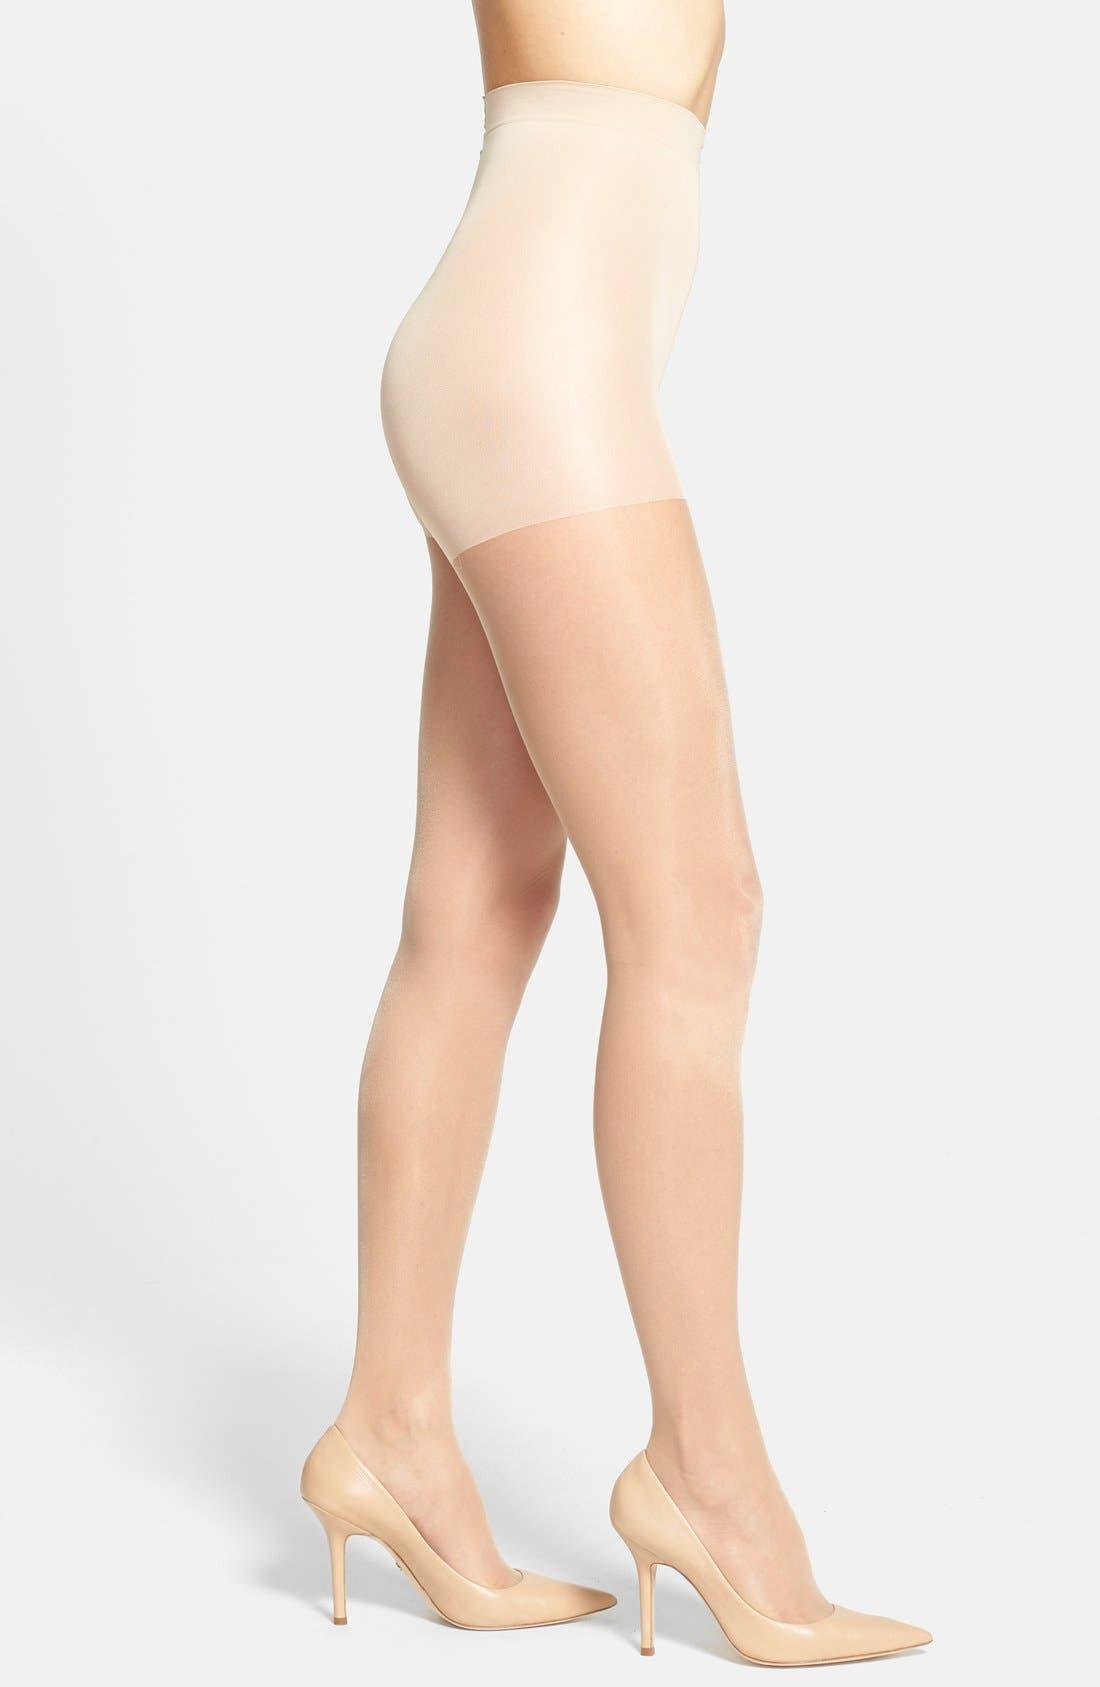 Main Image - Calvin Klein 'Sheer Essentials - Matte Ultra Sheer' Control Top Pantyhose